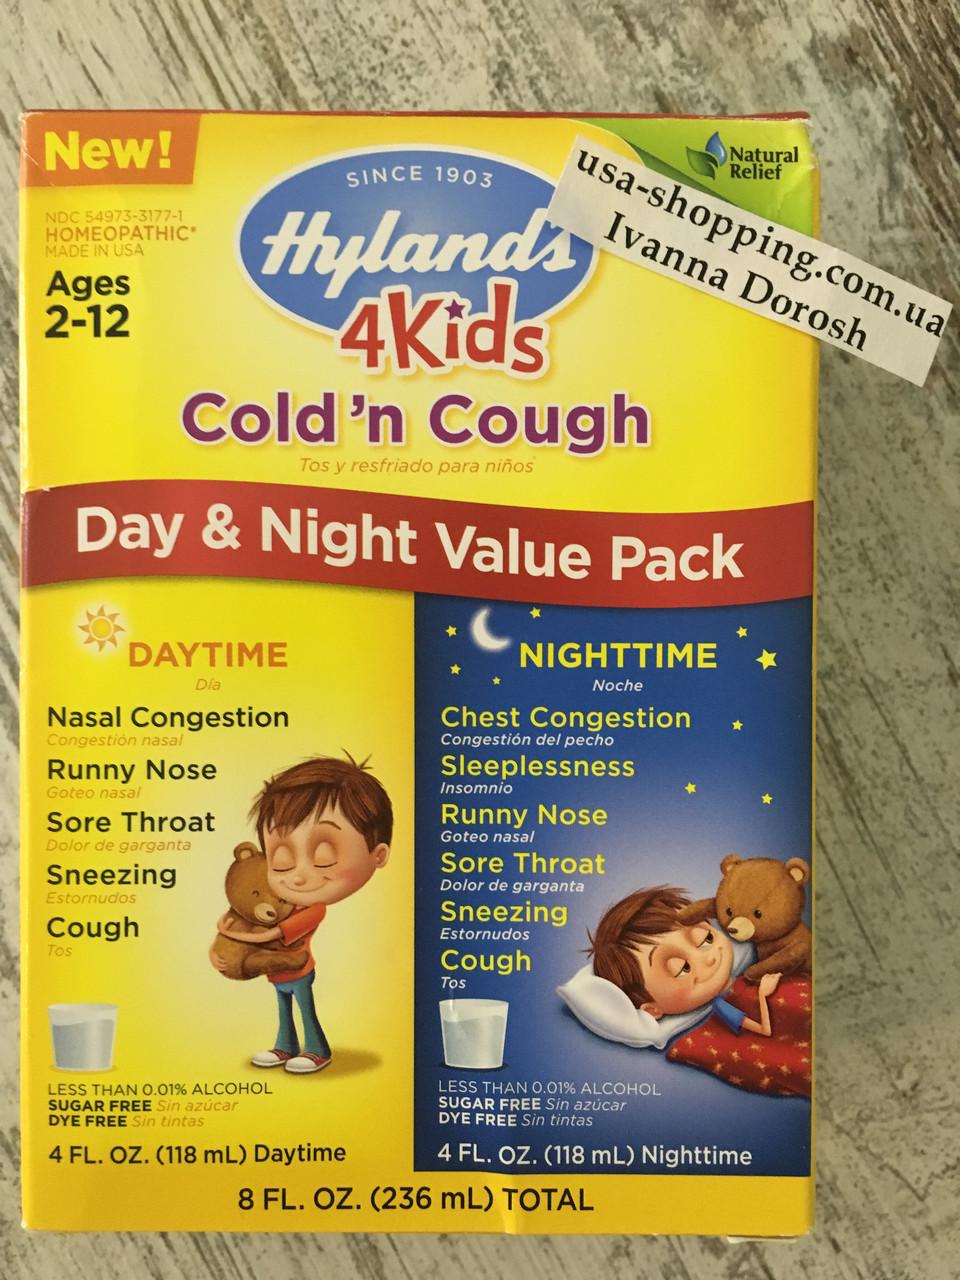 Hyland's, 4 Kids Cold 'n Cough Day & Night детские сиропы от простуды